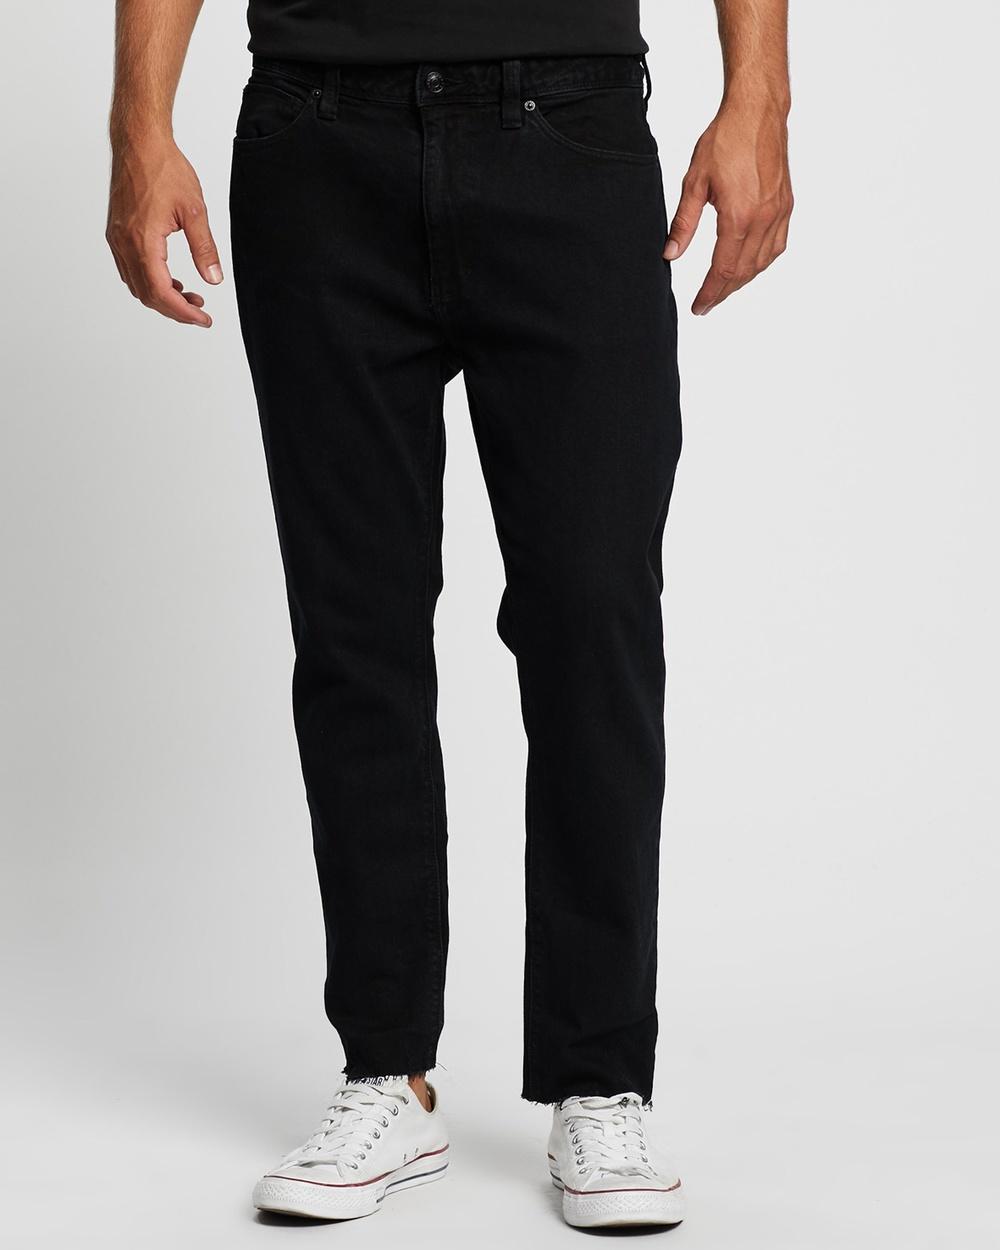 Abrand A Chopped Straight Jeans Slim Nite Flight